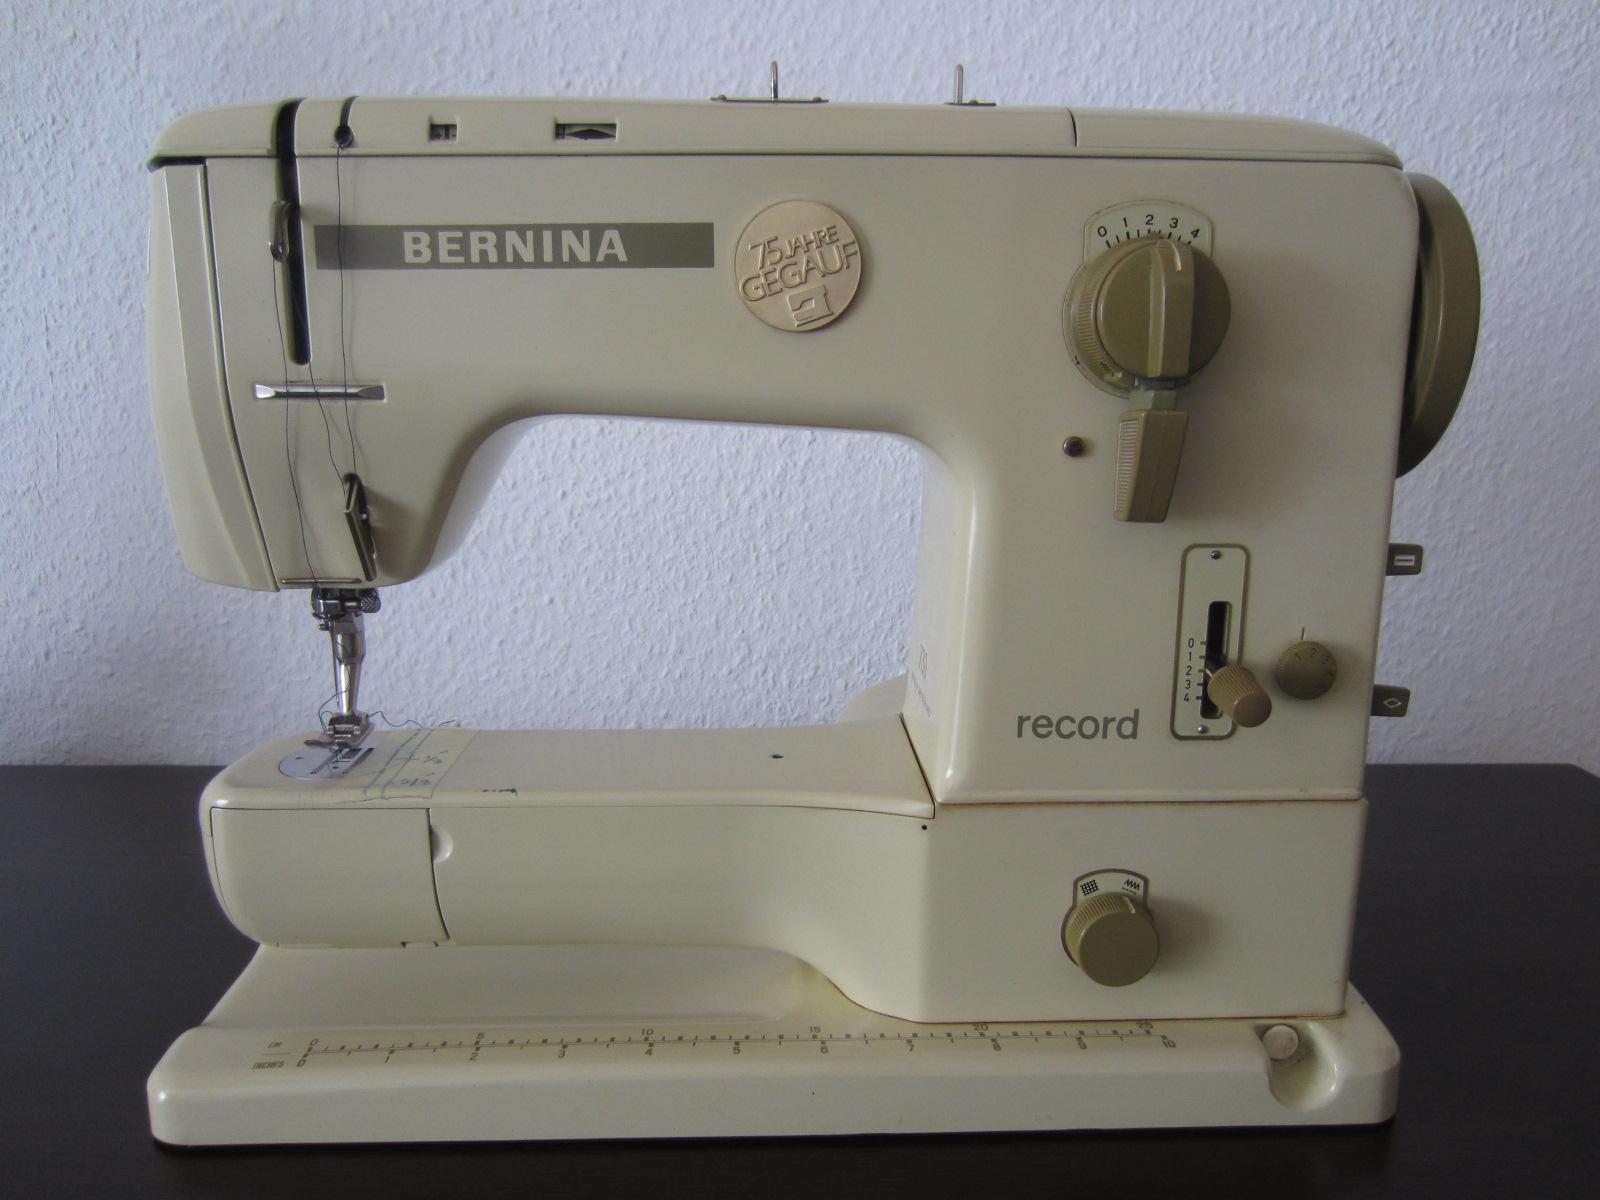 small resolution of retro tech geneva sewing machine sundays bernina record jpg 1600x1200 used bernina sewing machines sale